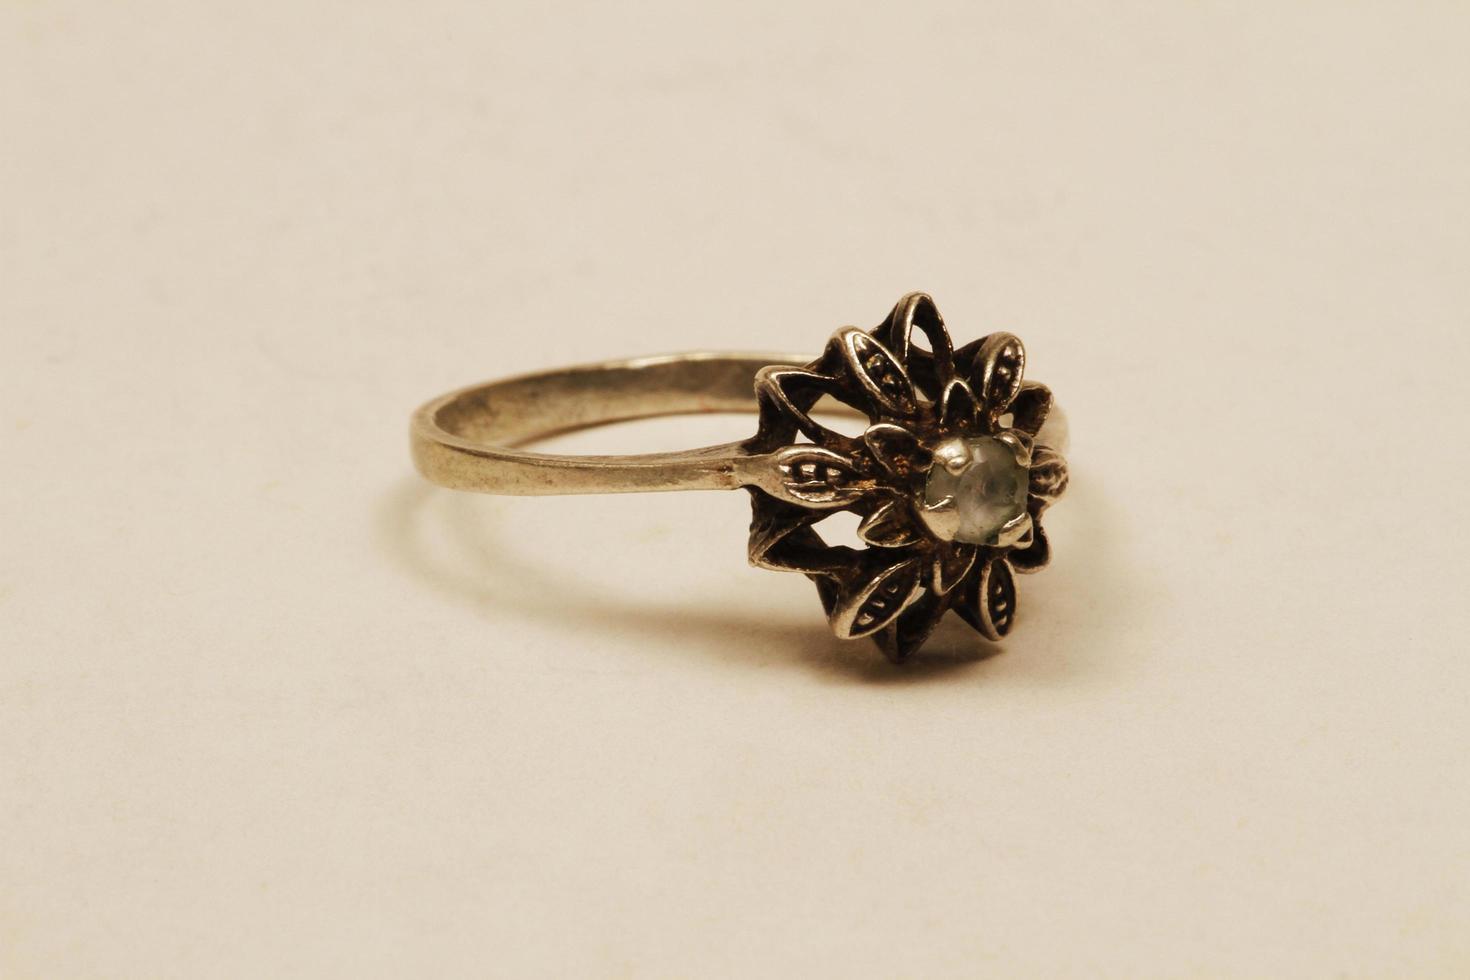 istanbul, kalkon, 2021 - handgjord antik ring foto